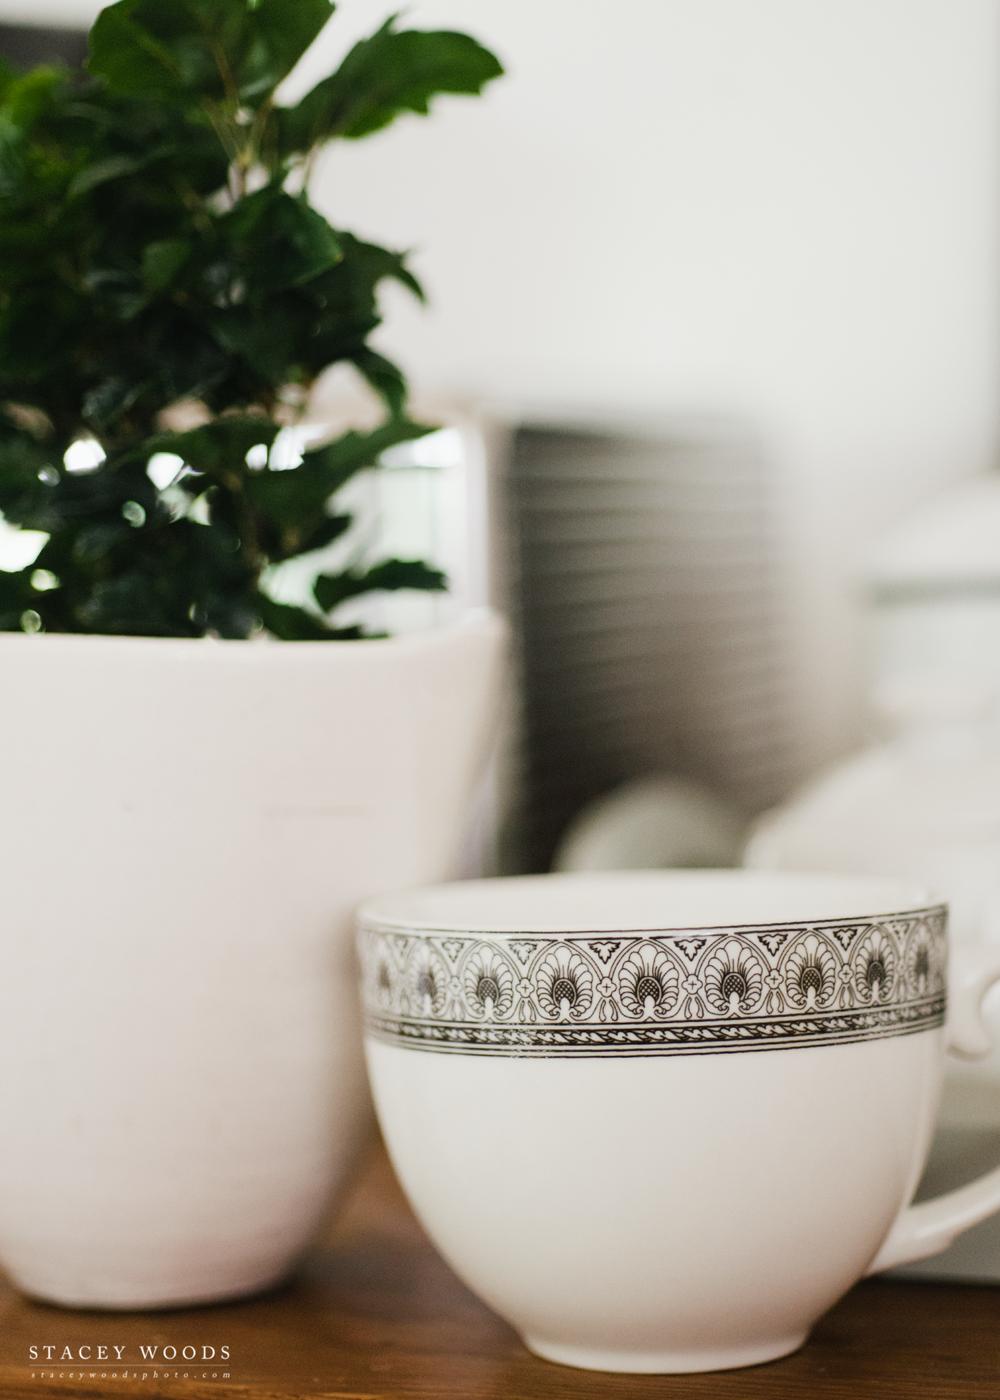 Nammie Bird's cup